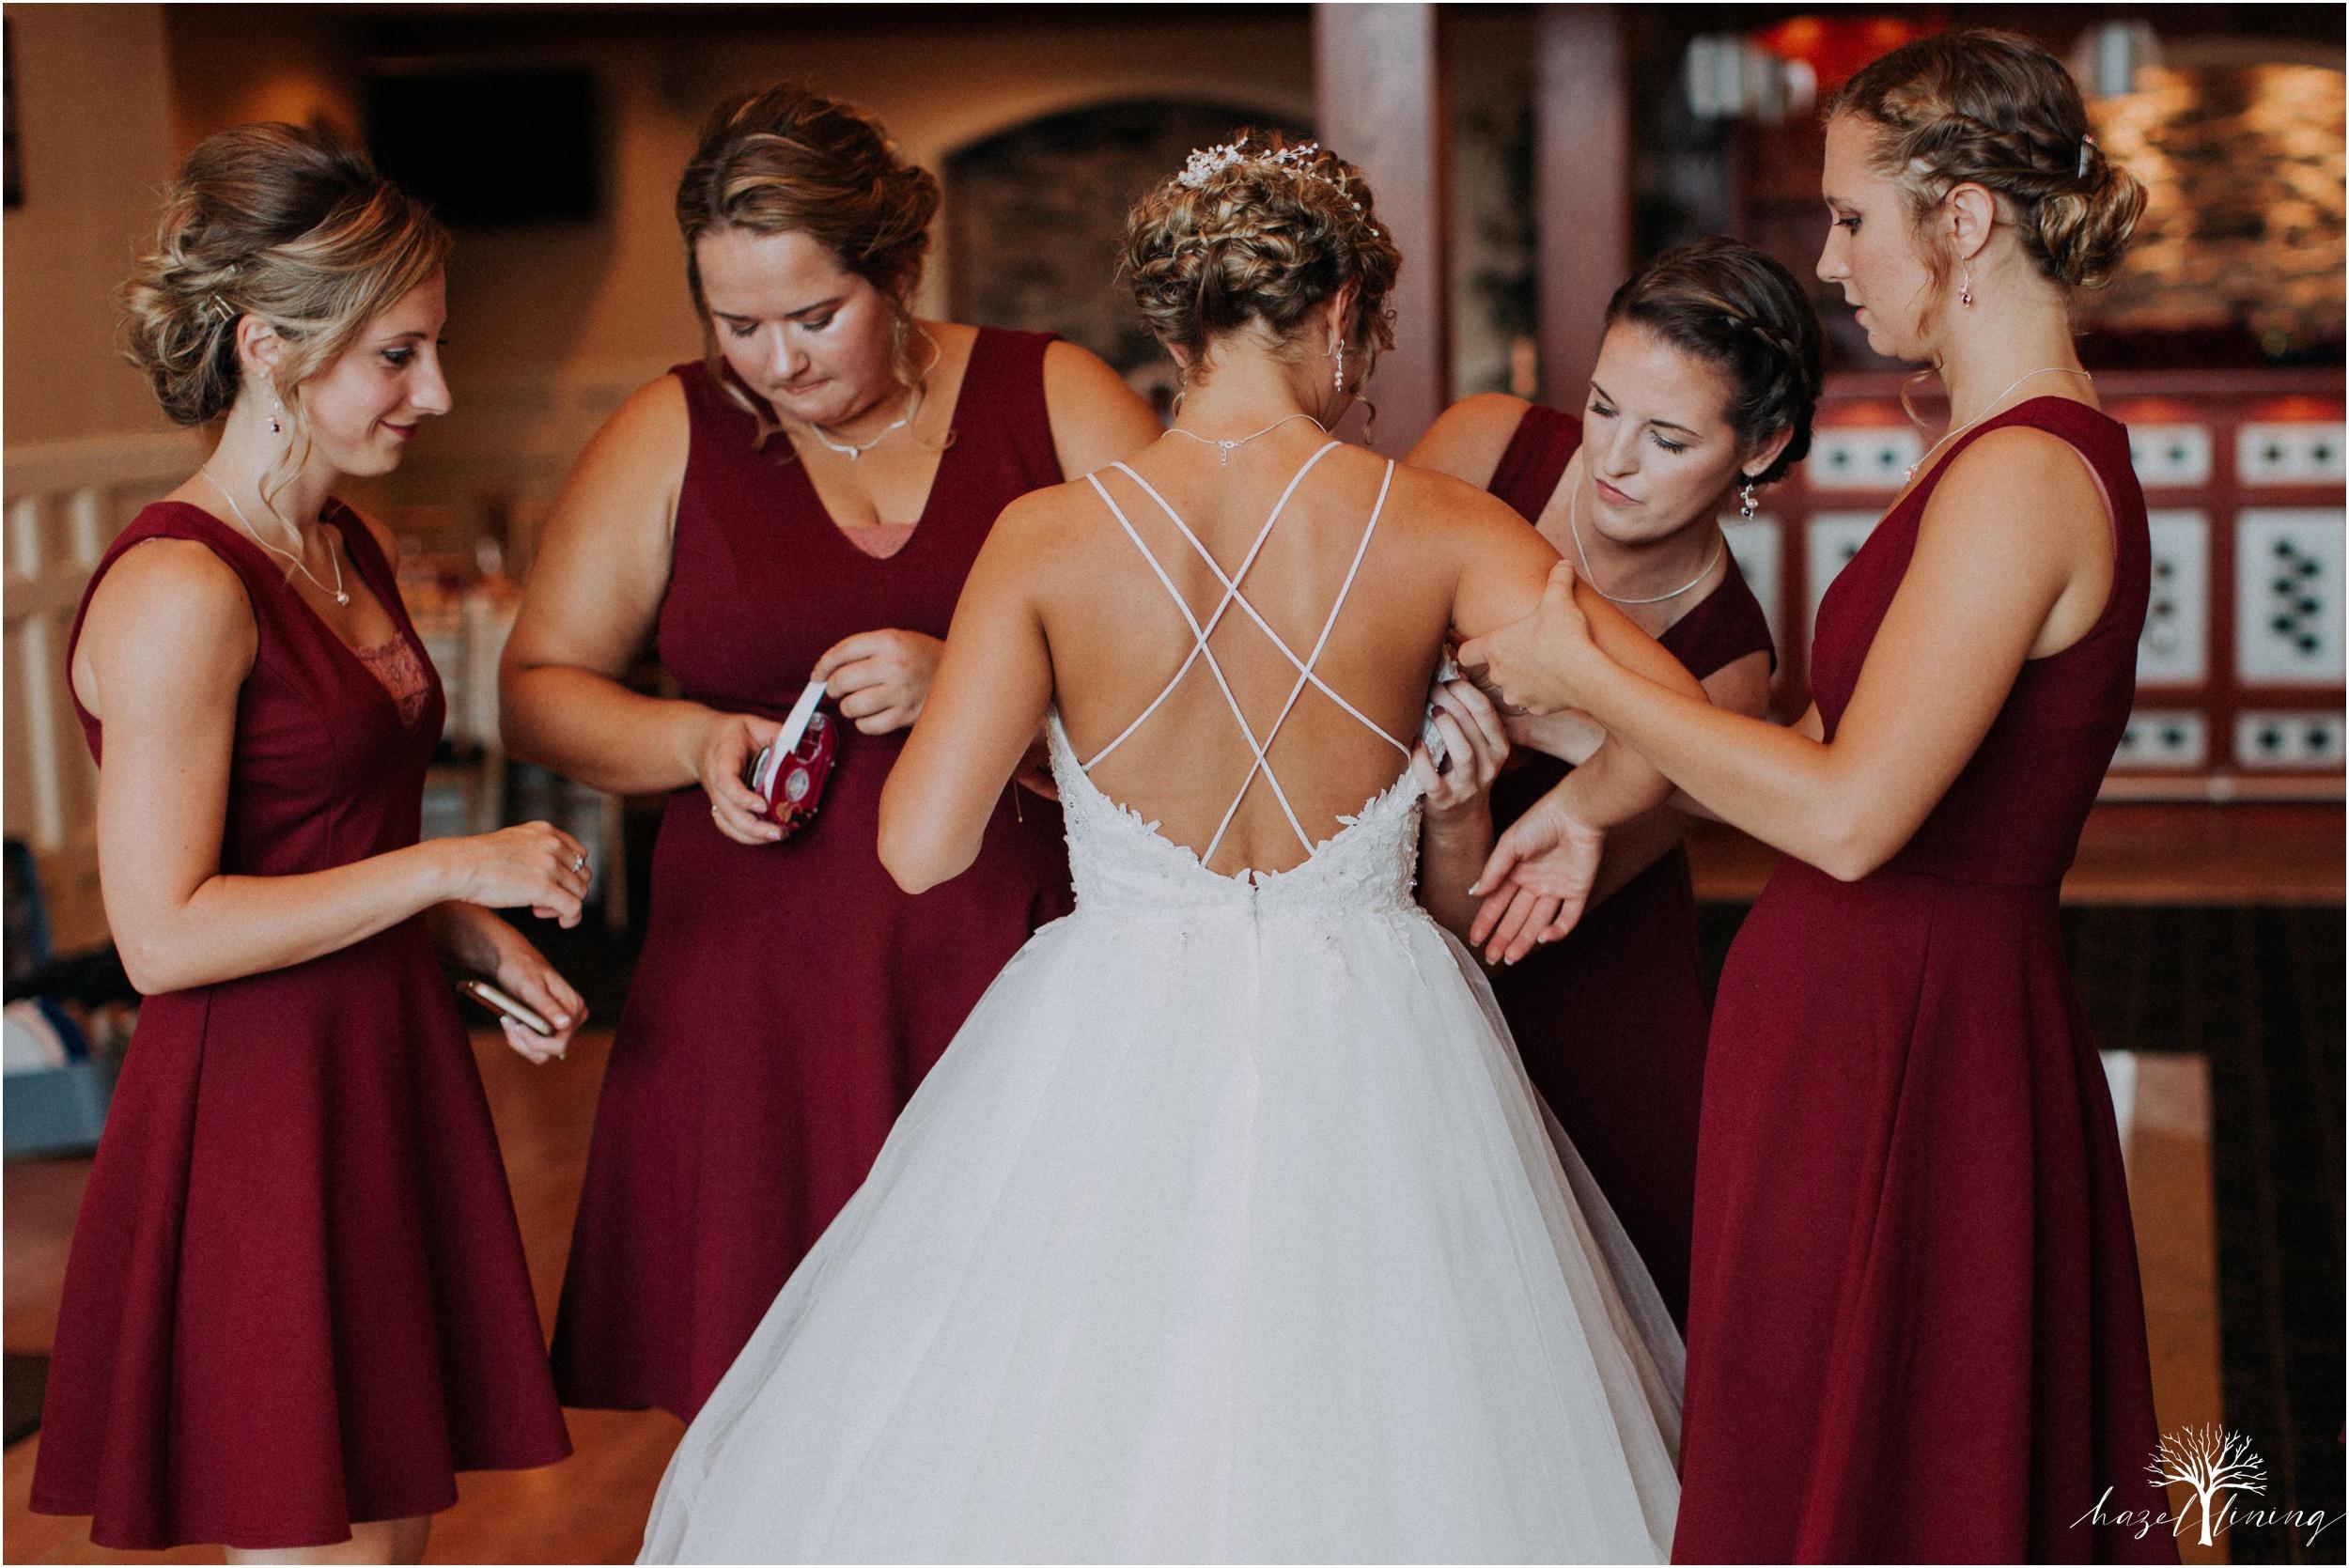 jonathan-weibel-becky-haywood-loft-at-sweetwater-cc-pennsburg-pennsylvania-rainy-day-summer-wedding-hazel-lining-travel-wedding-elopement-photography_0021.jpg